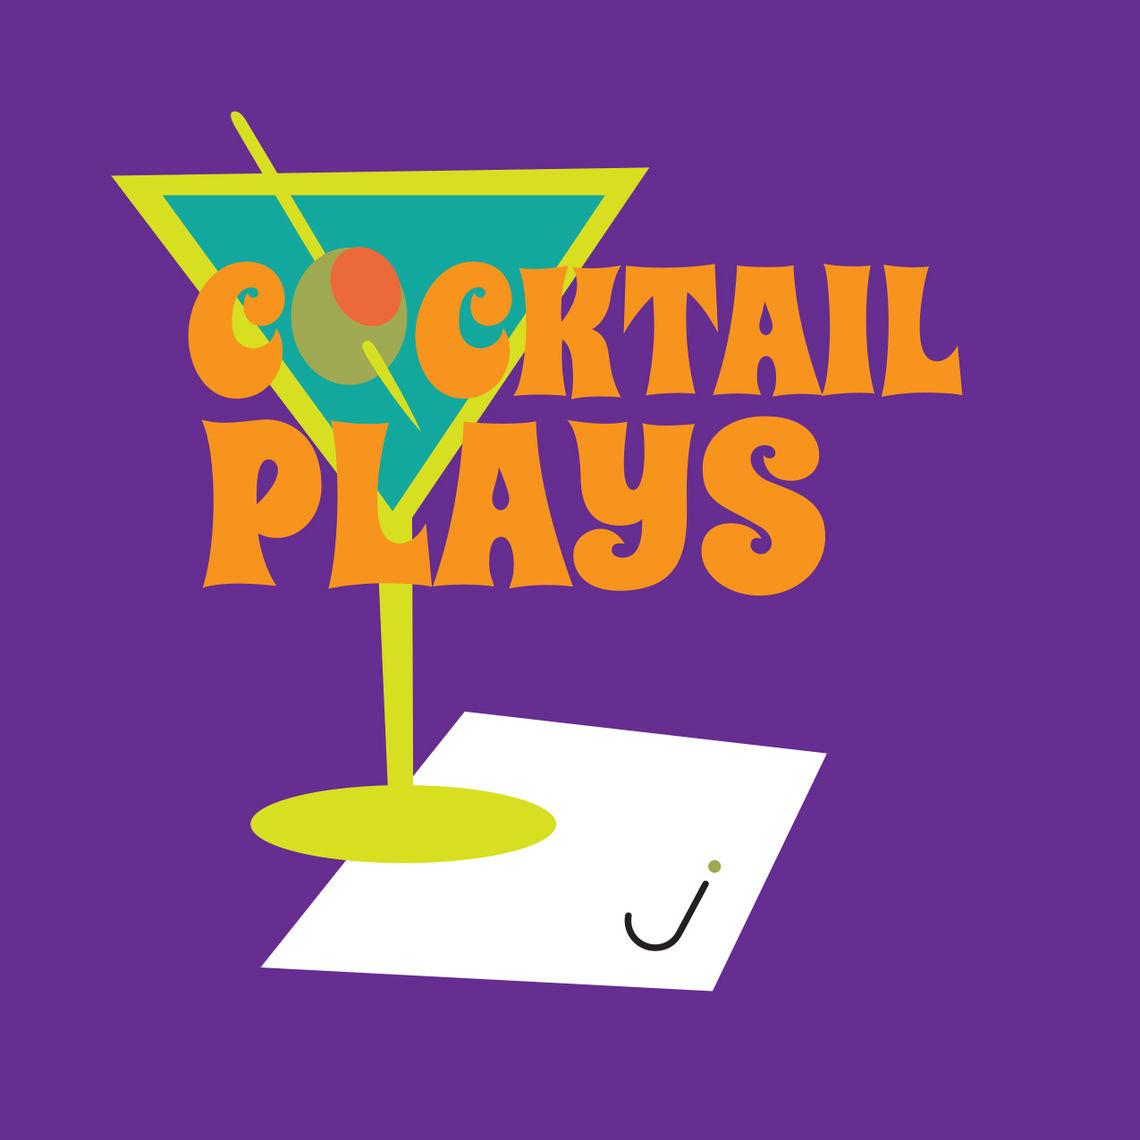 juniper cocktail plays logo